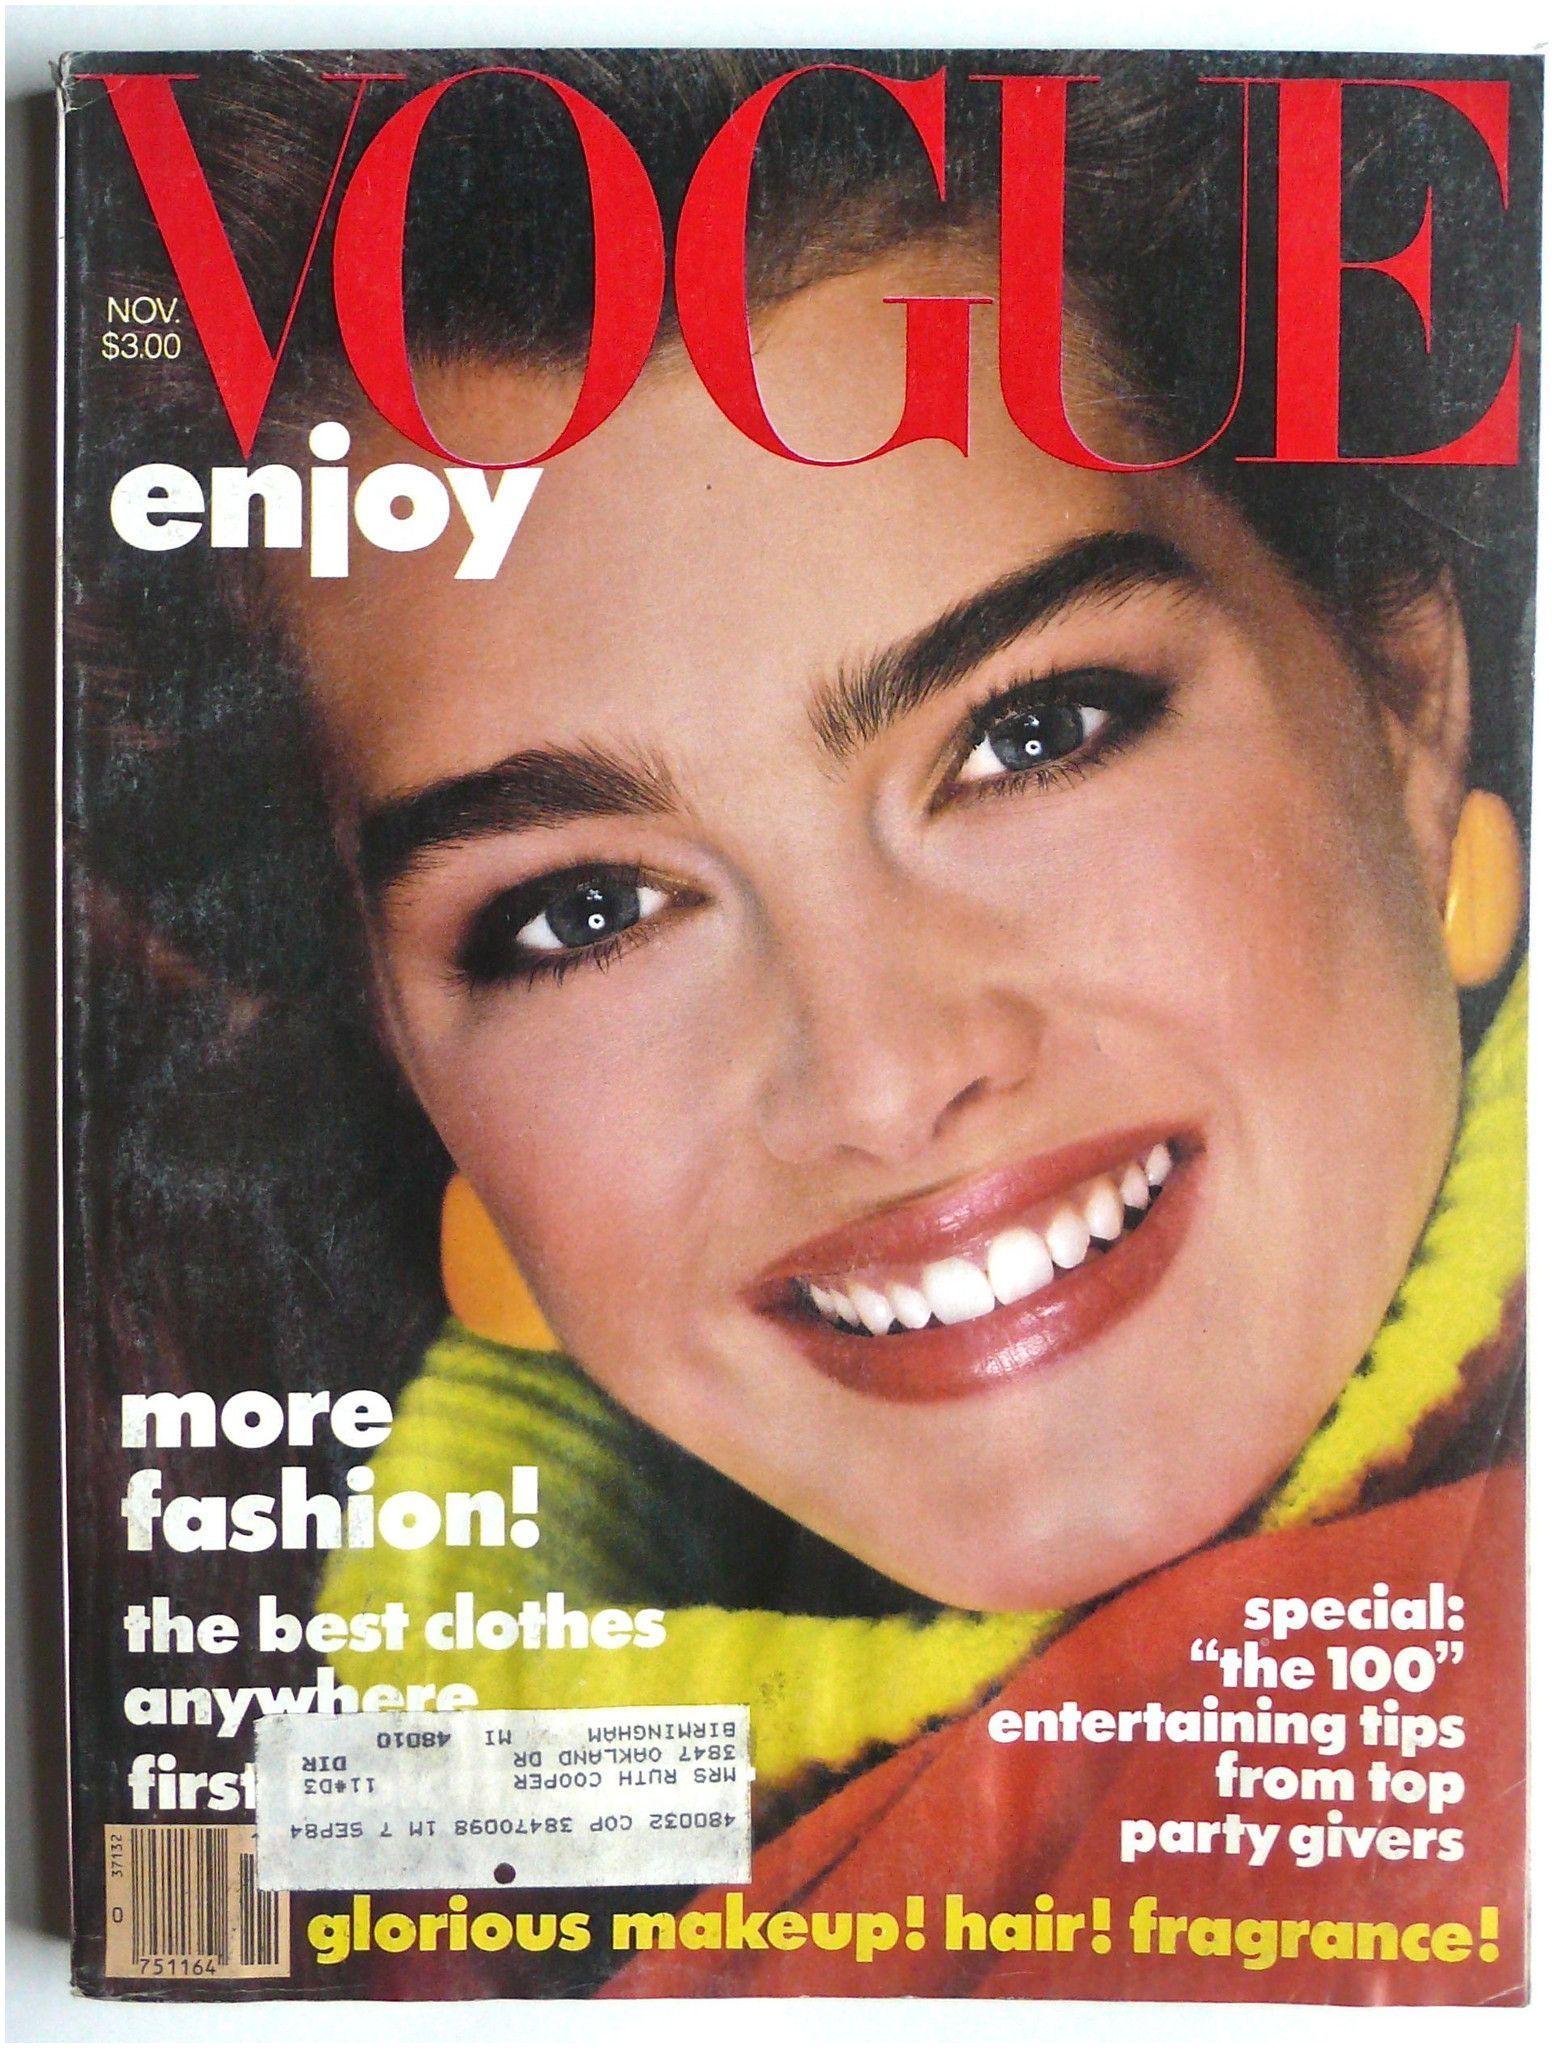 Vogue magazine November 1983